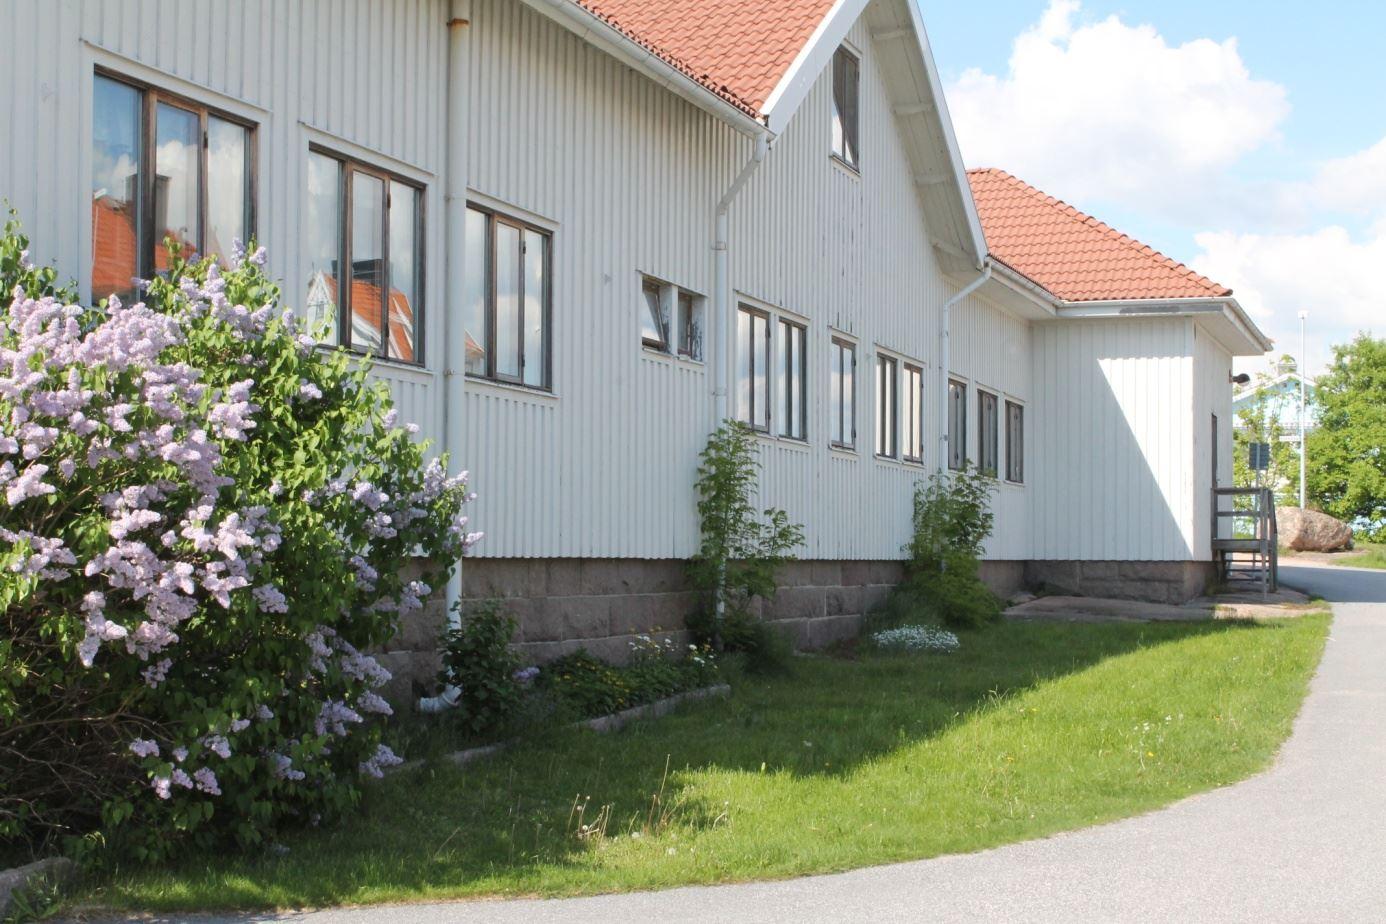 Hovenäsets SVIF Vandrarhem i Kungshamn